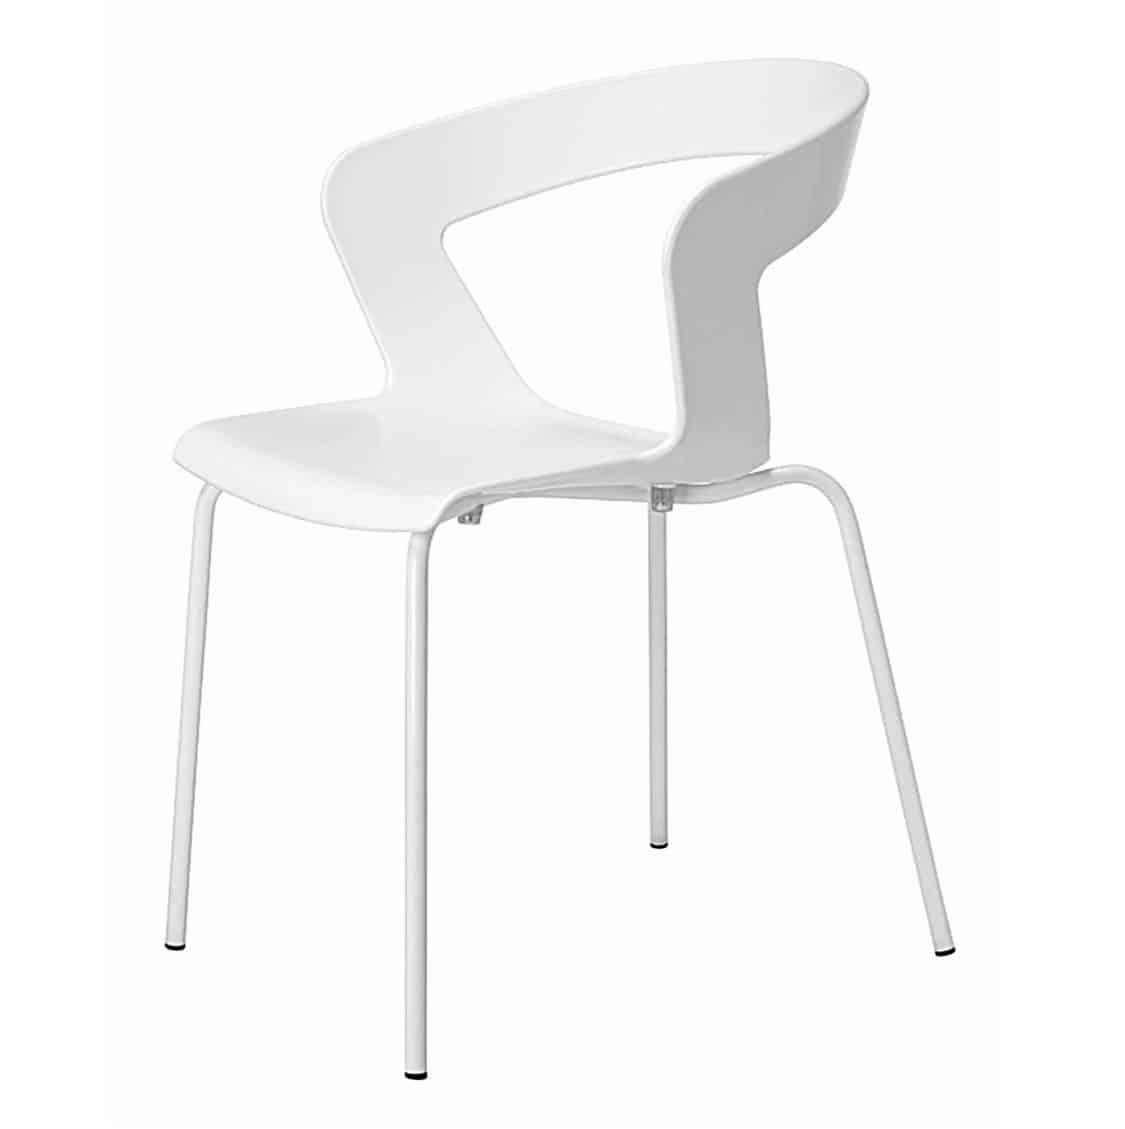 Ibis Armchair Stackable Outdoor Chair ETAL DeFrae Contract Furniture White